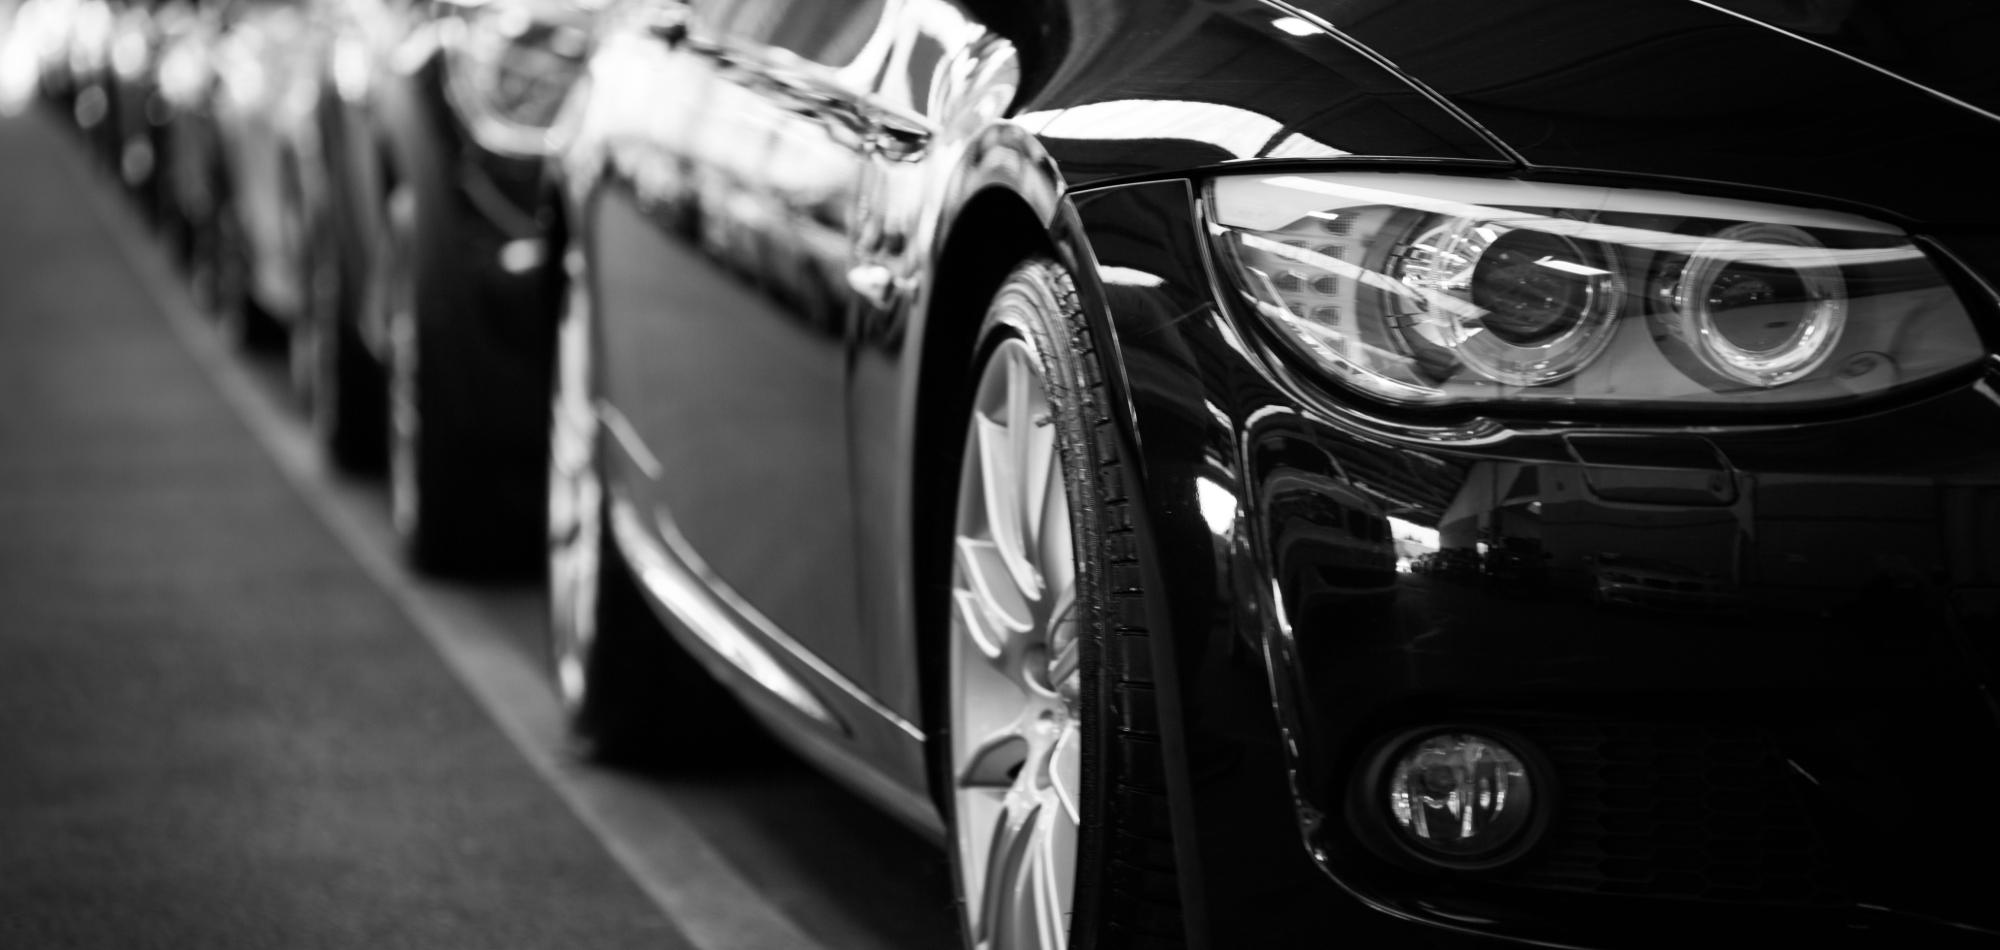 automobiles-automotives-black-and-white-black-and-white-70912